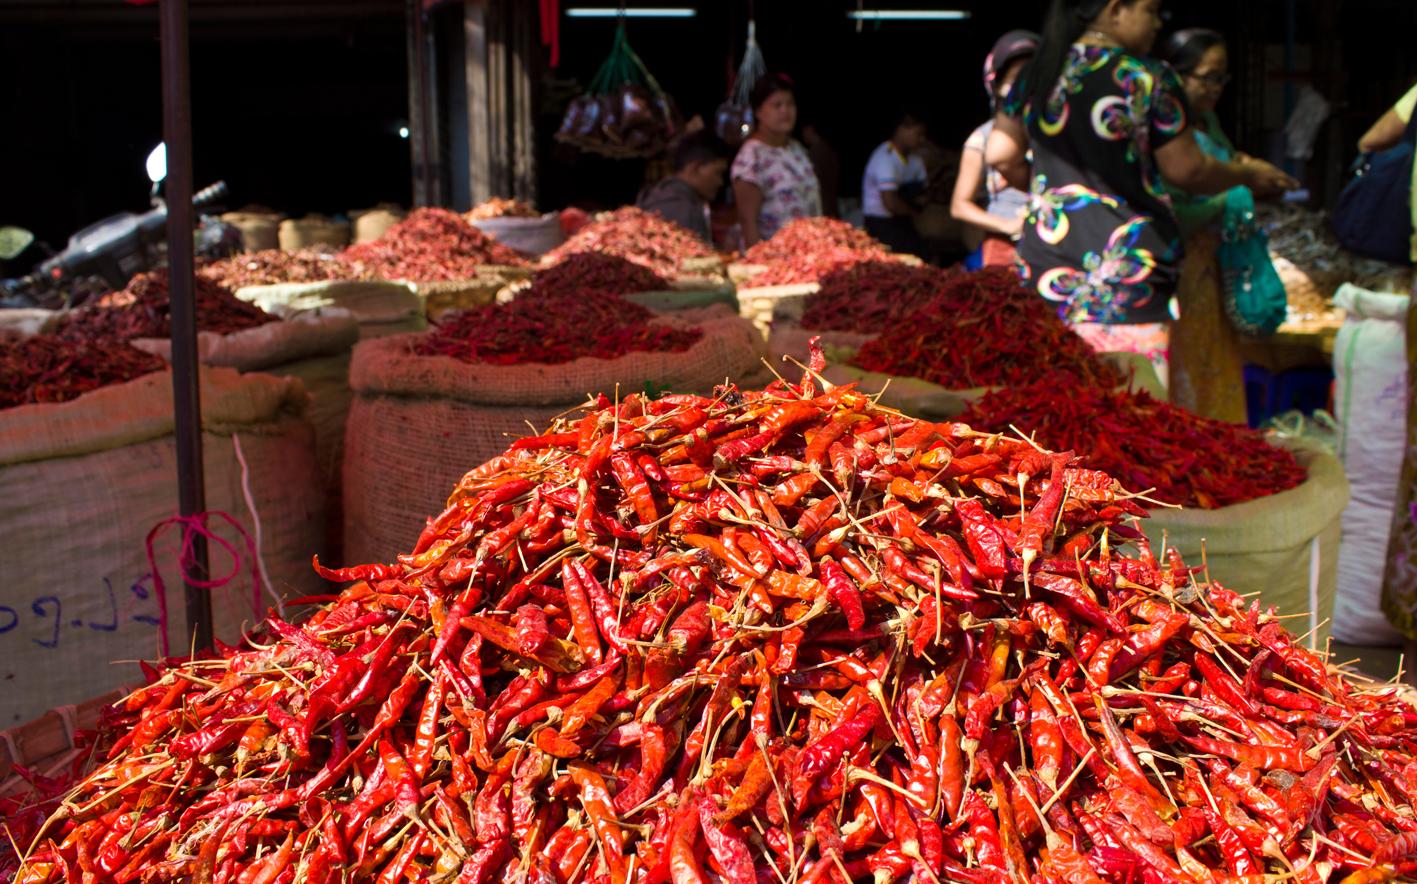 Market in Mandalay, Myanmar (Burma)